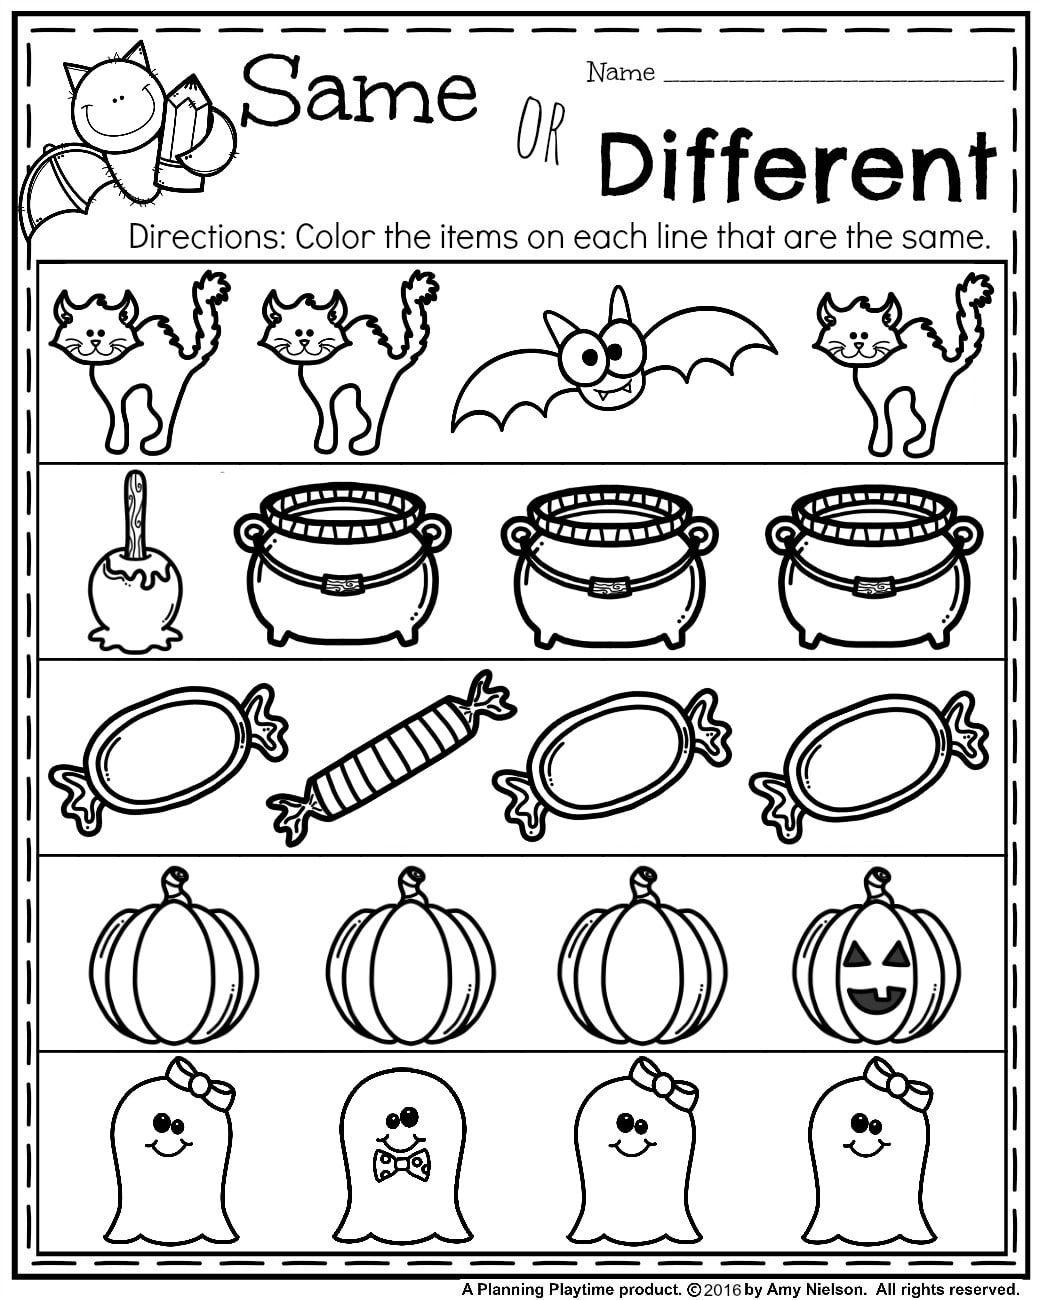 October Preschool W Ksheets W Ksheets October Nd Ctivities